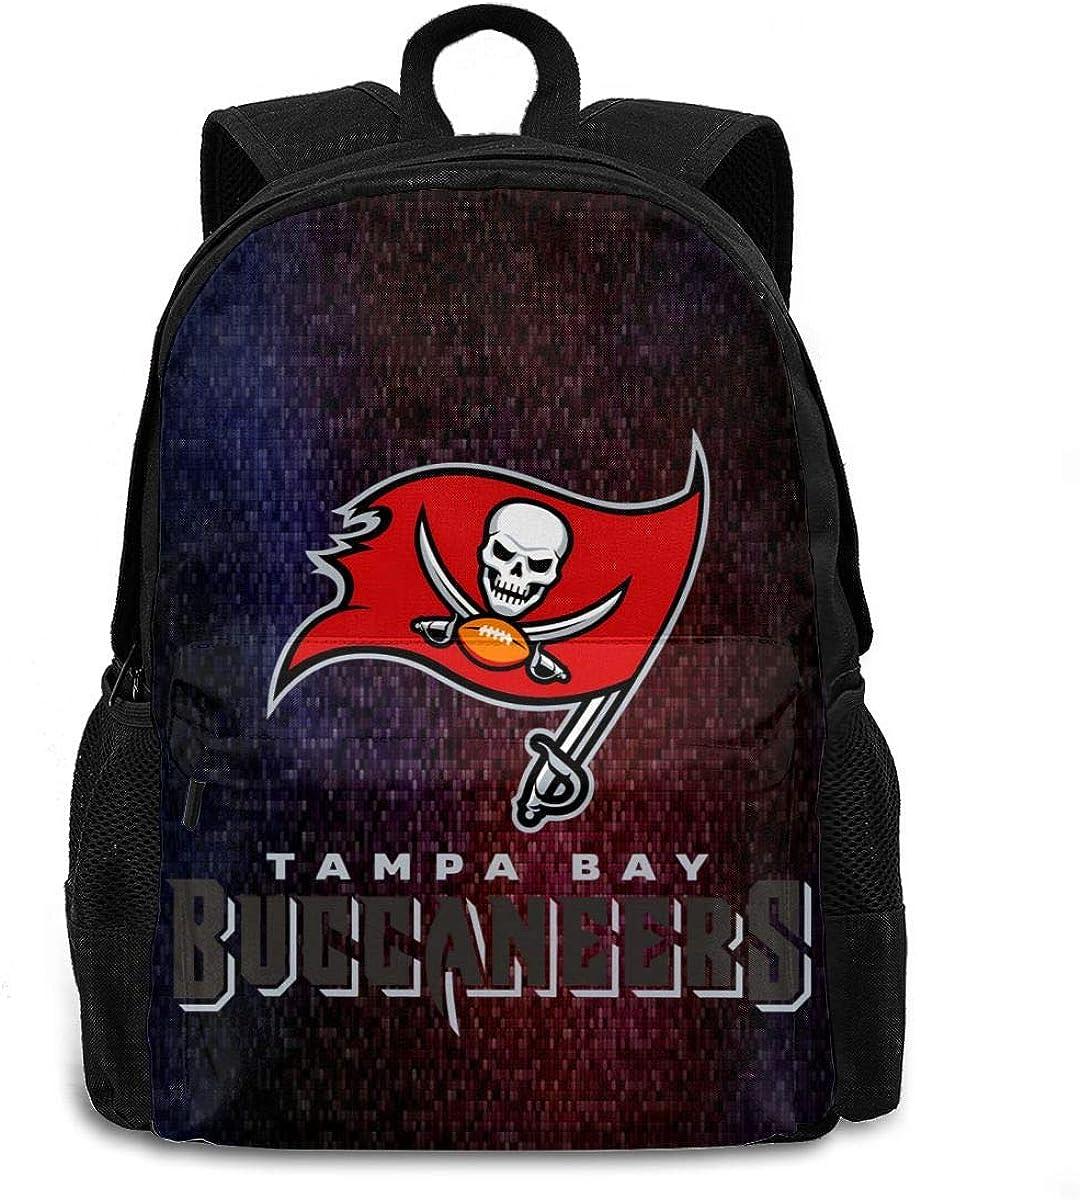 Tampa Bay Brady Backpack Unisex Student Cartoon School Bag Rucksack Teen Boy Girl Backpack